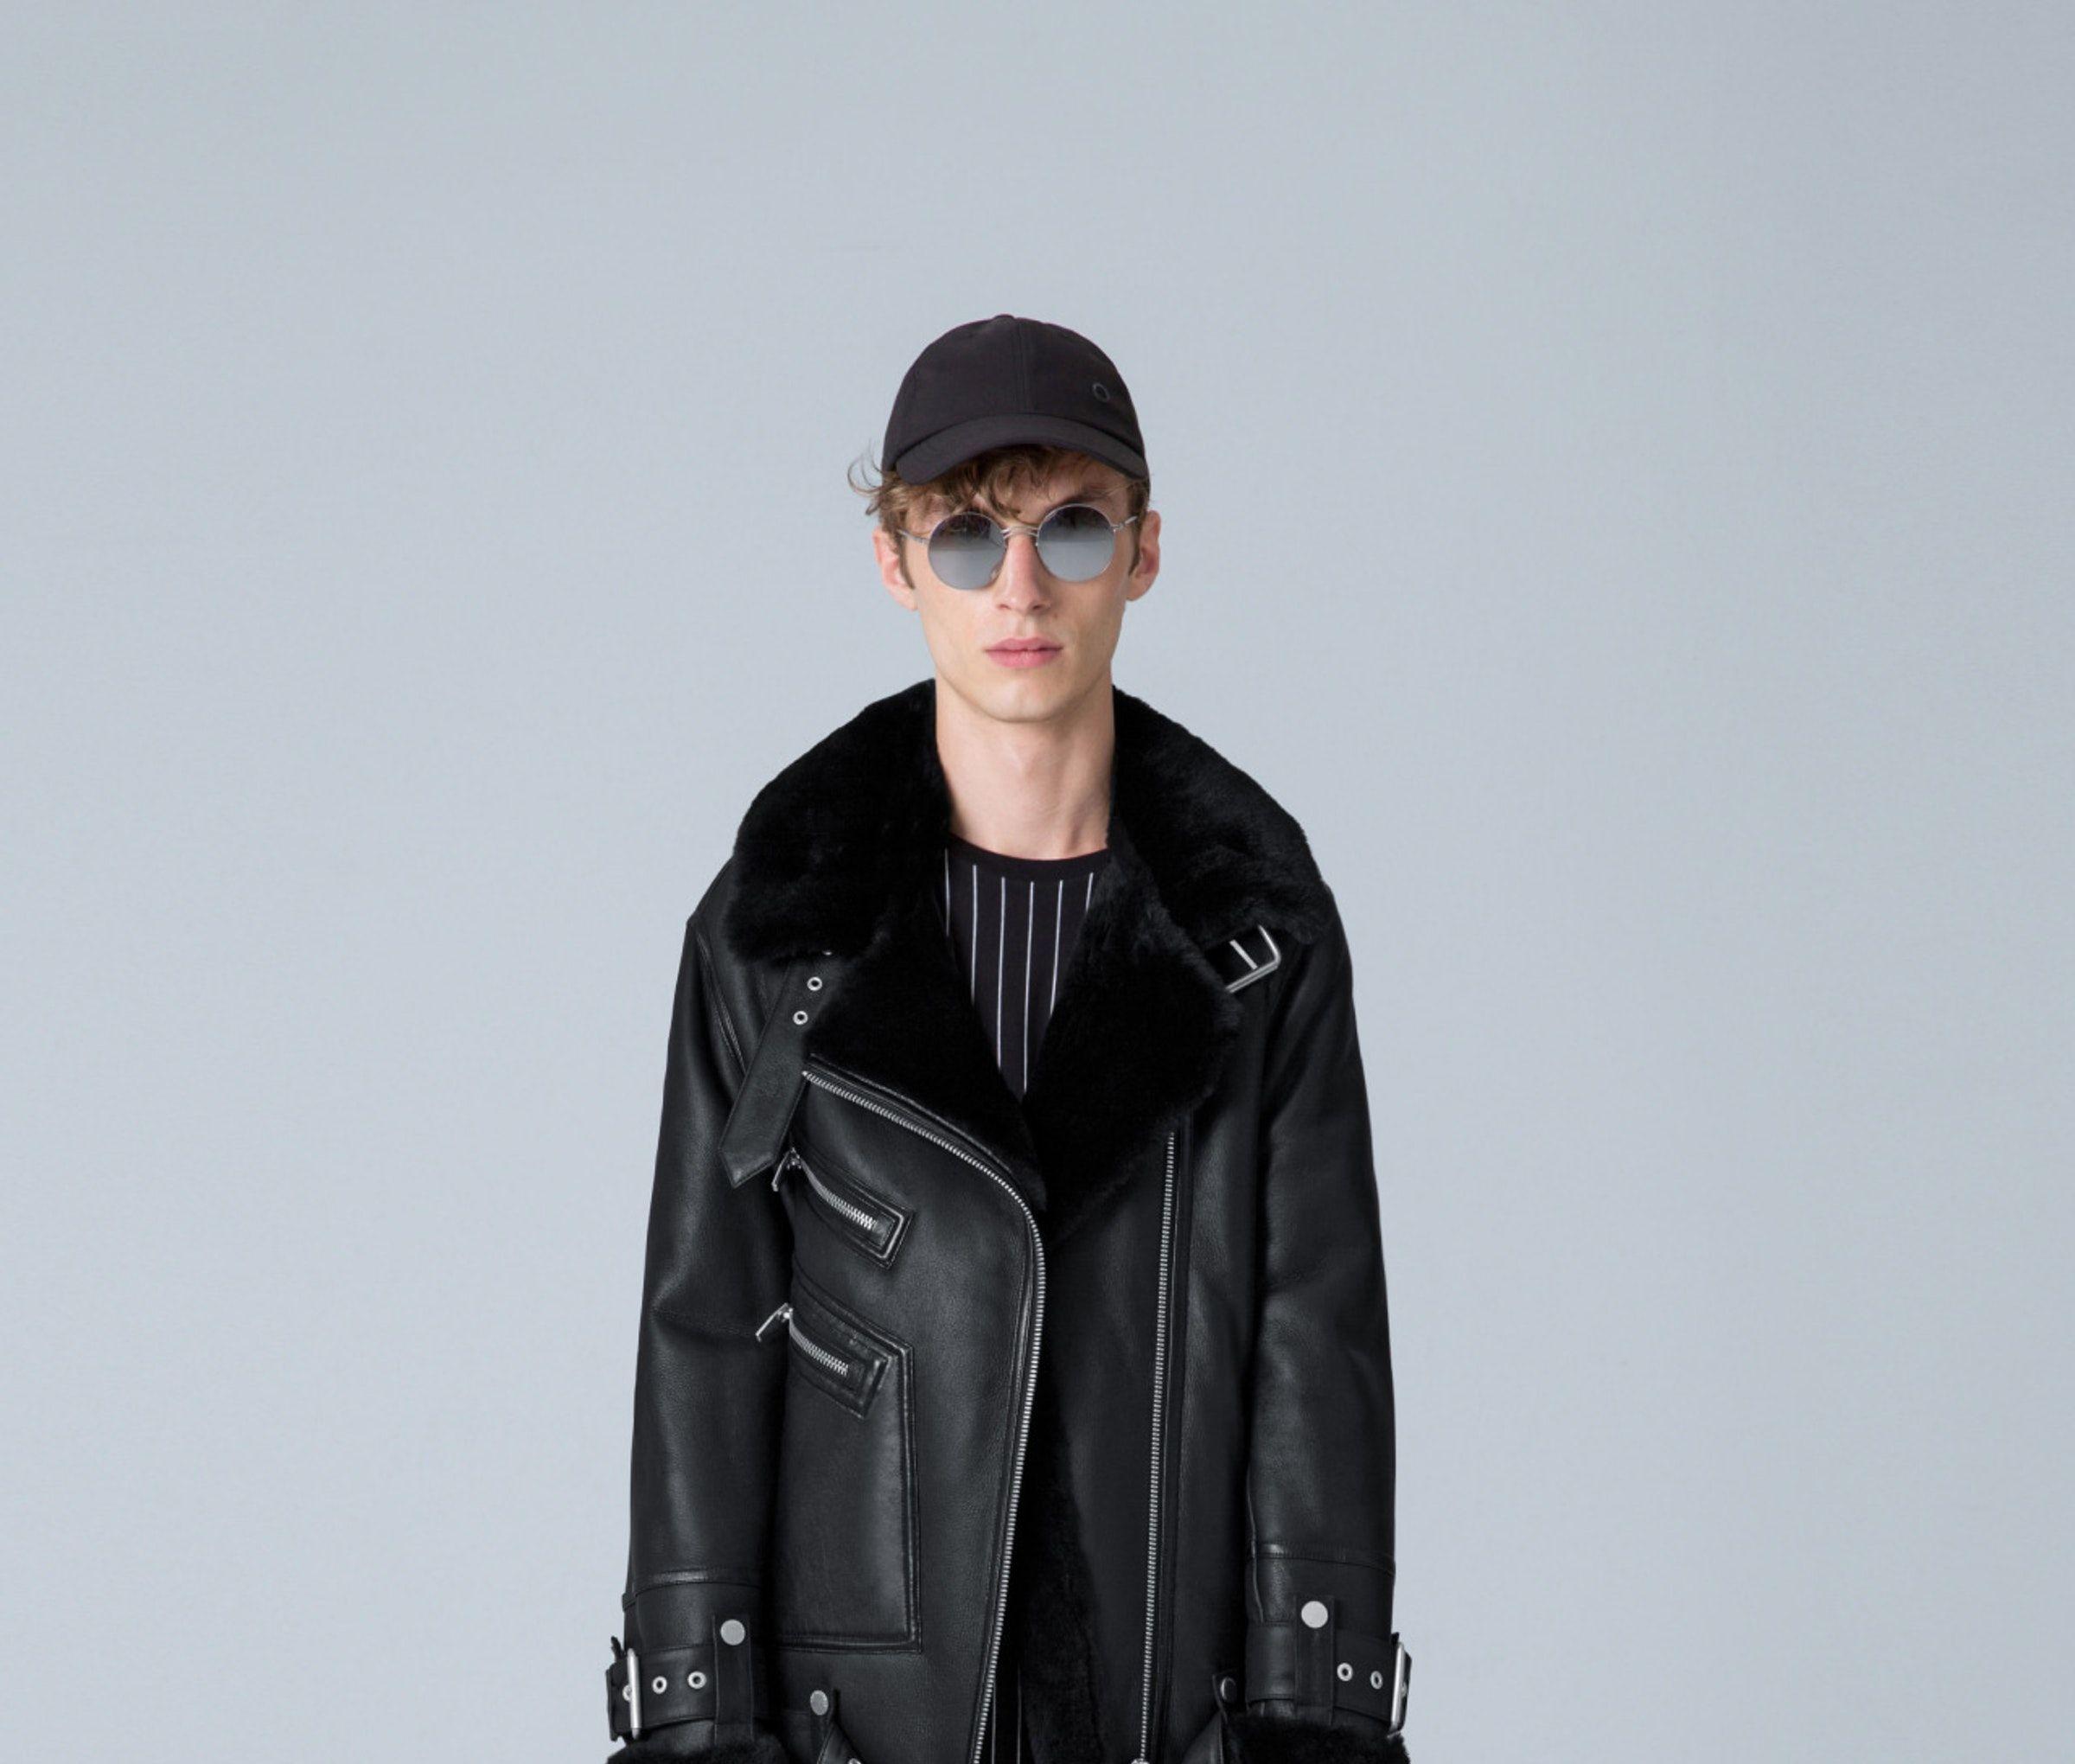 Moya Iii The Arrivals Leather Jacket Shearling Jacket Jackets [ 2040 x 2400 Pixel ]